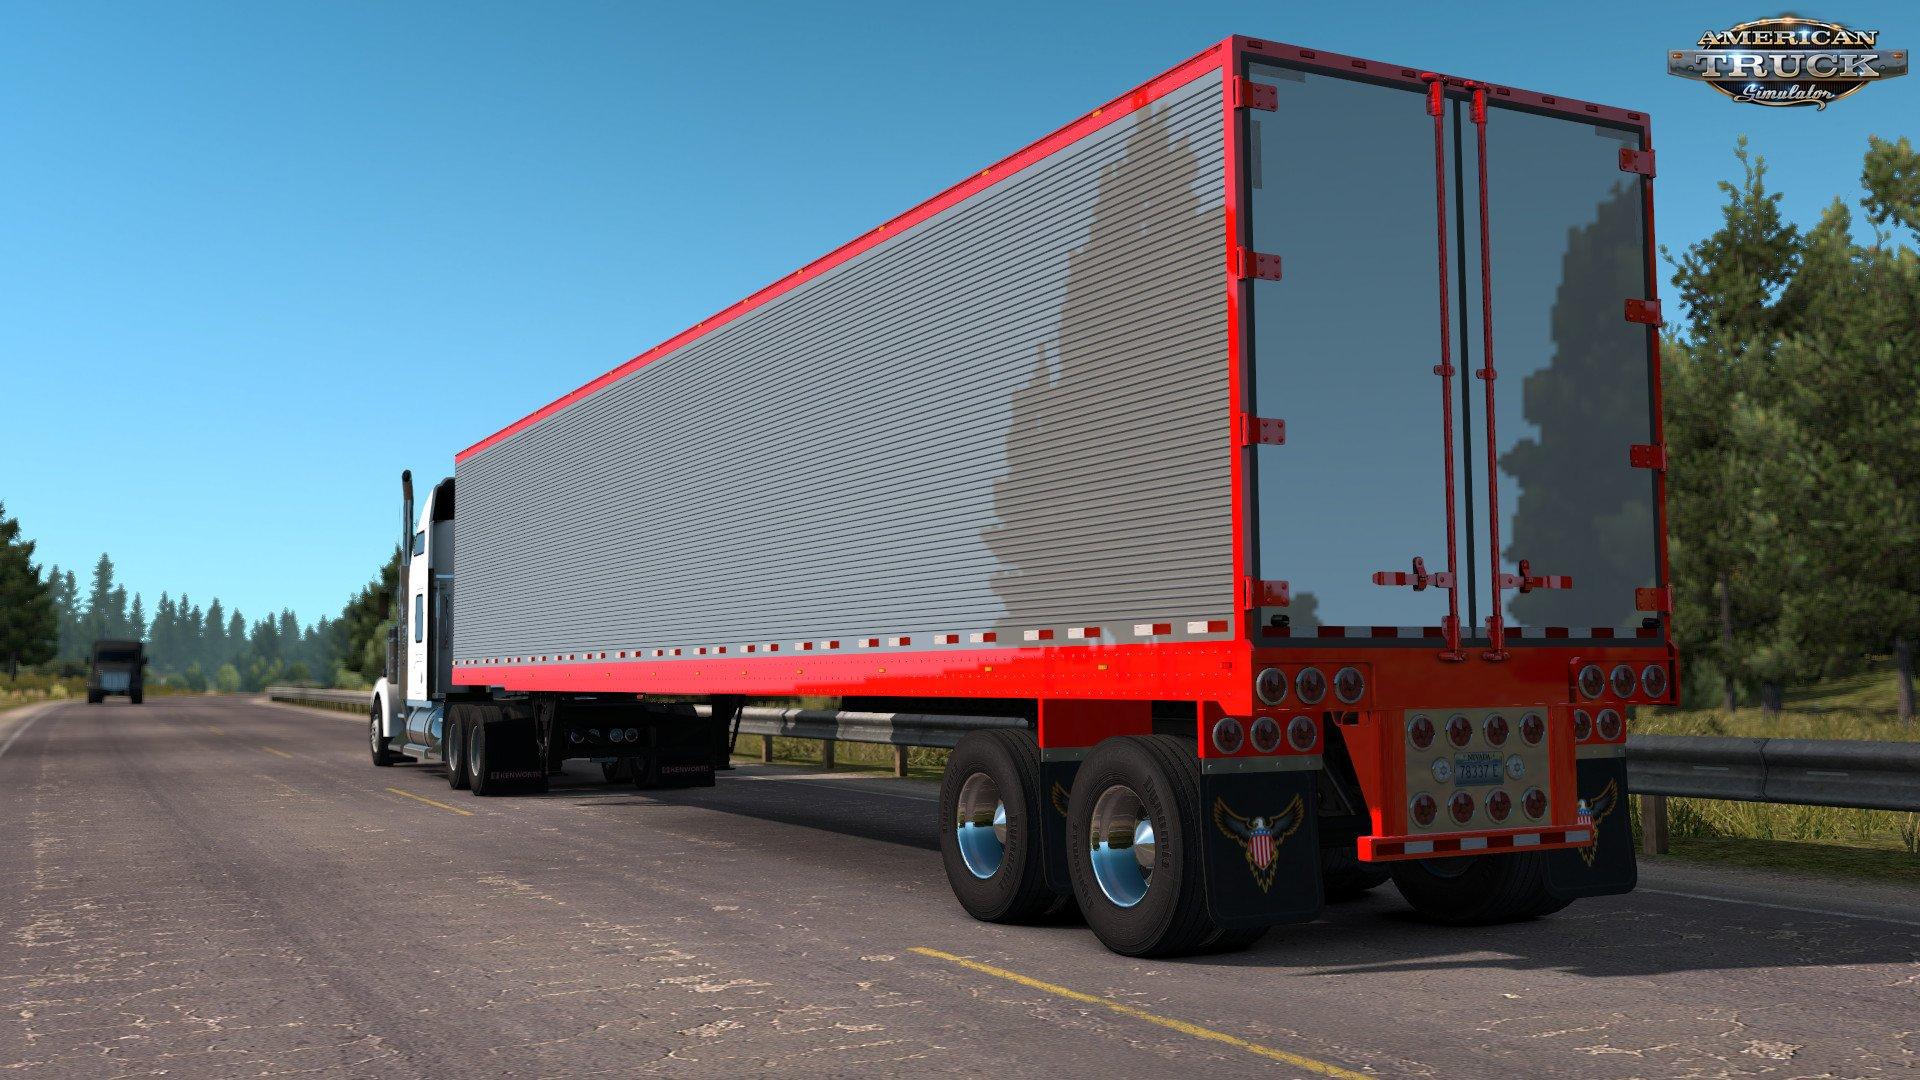 Custom 53' trailer v1.2 for Ats